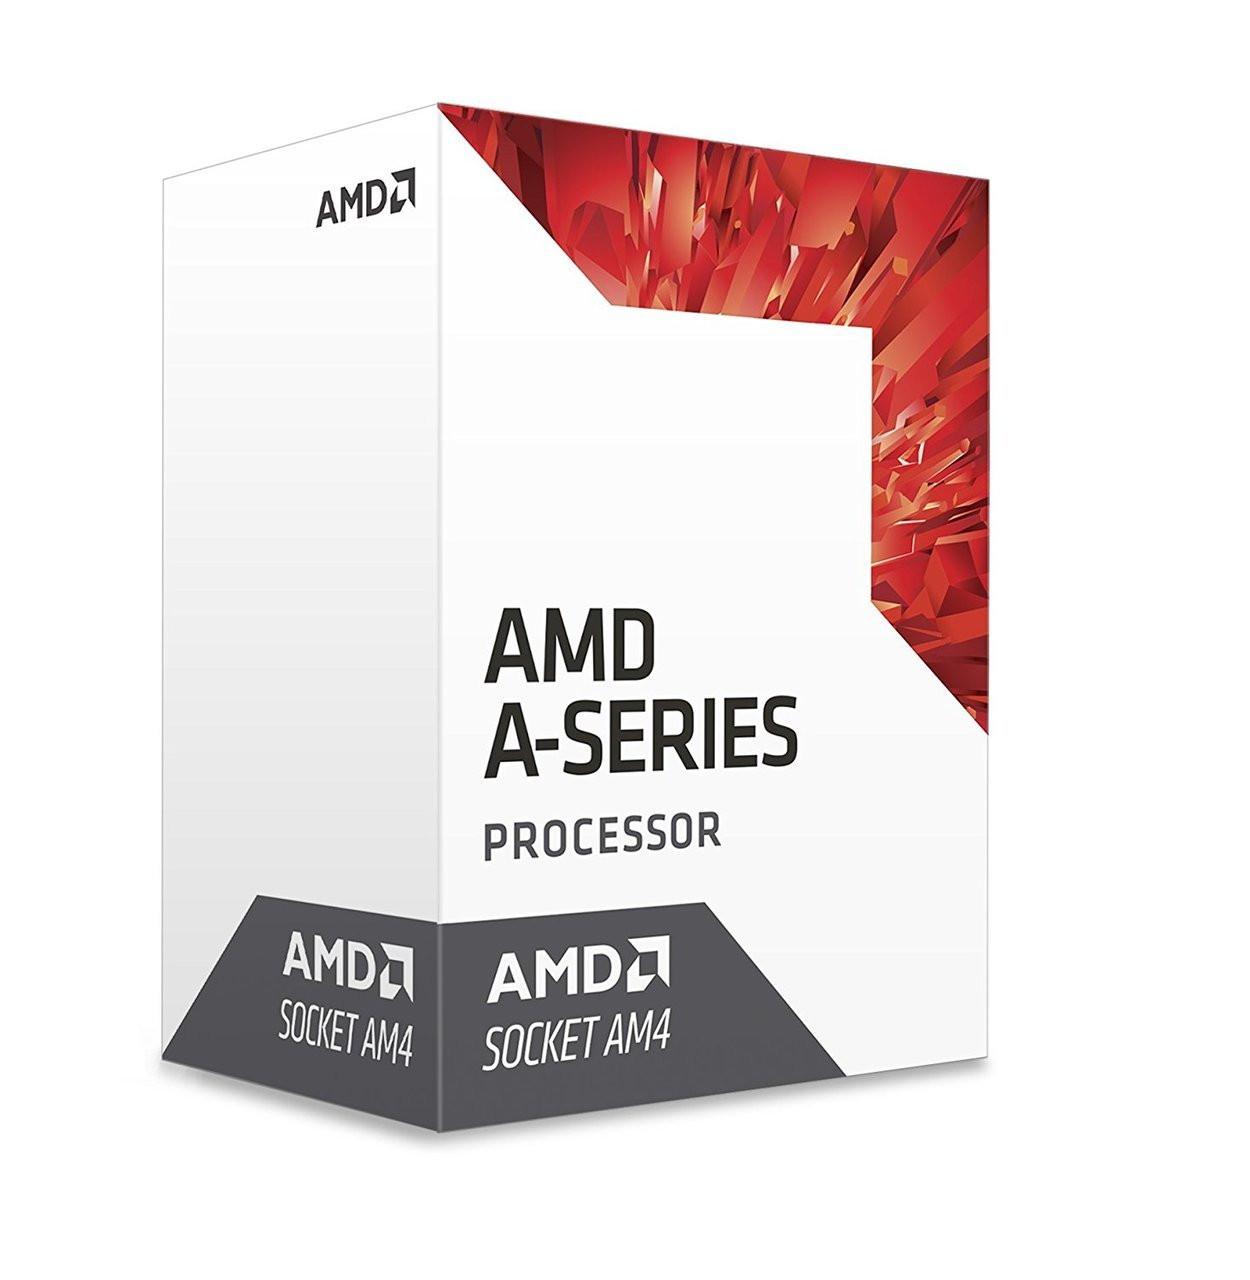 Amd Fd6300wmhkbox Fx 6300 6 Core Processor Black Edition Box Ad9700agabbox A10 9700 4 350 Ghz Socket Am4